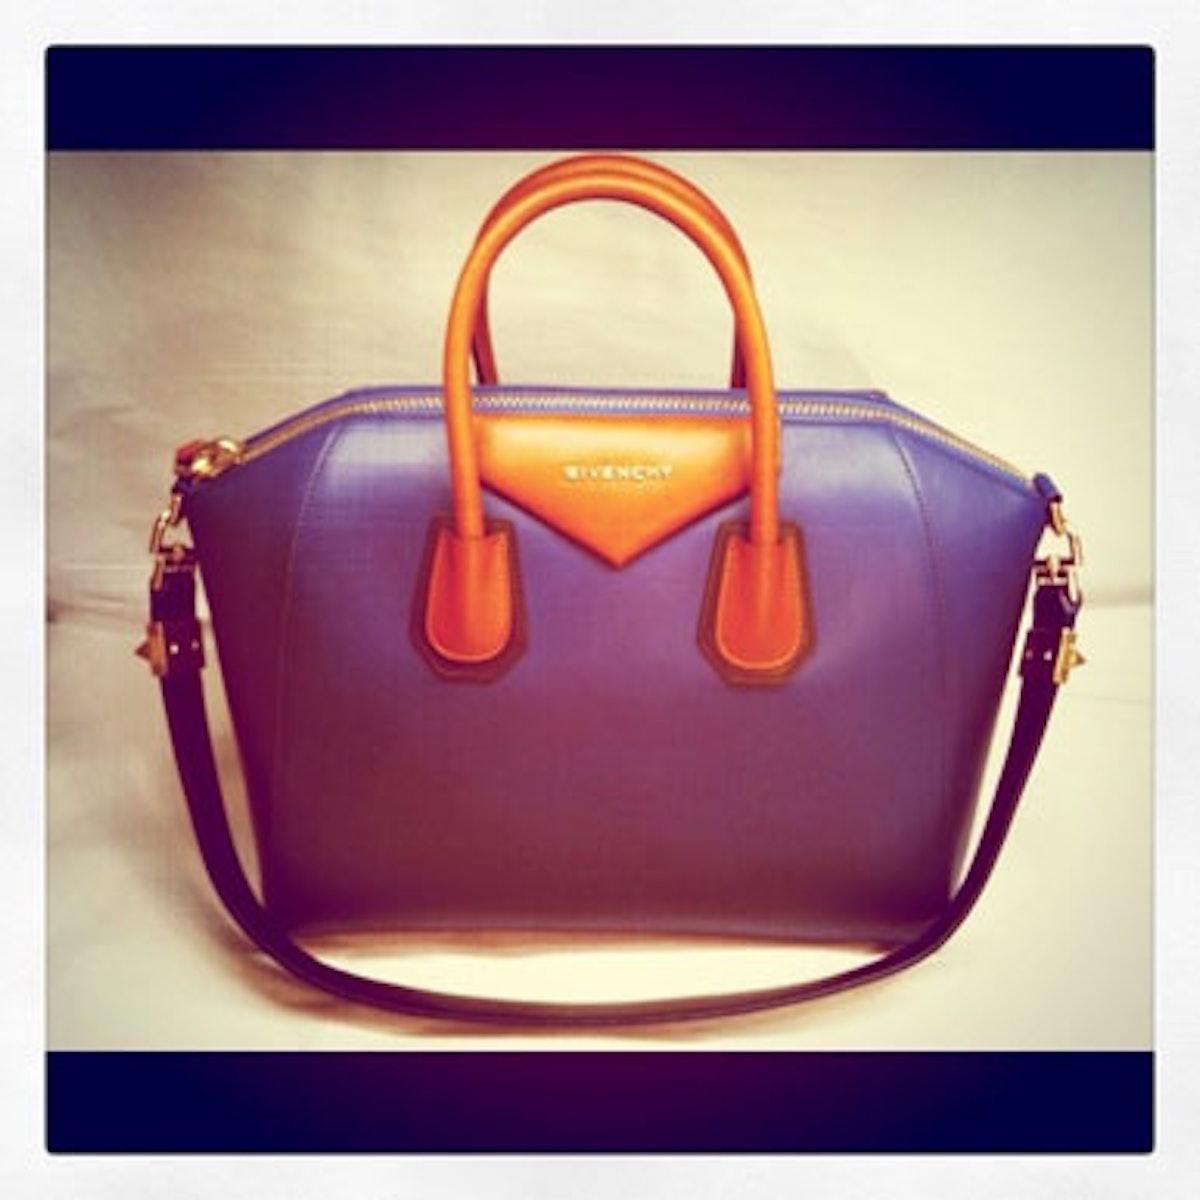 blog-obsessions-Givenchy-Bag.jpg